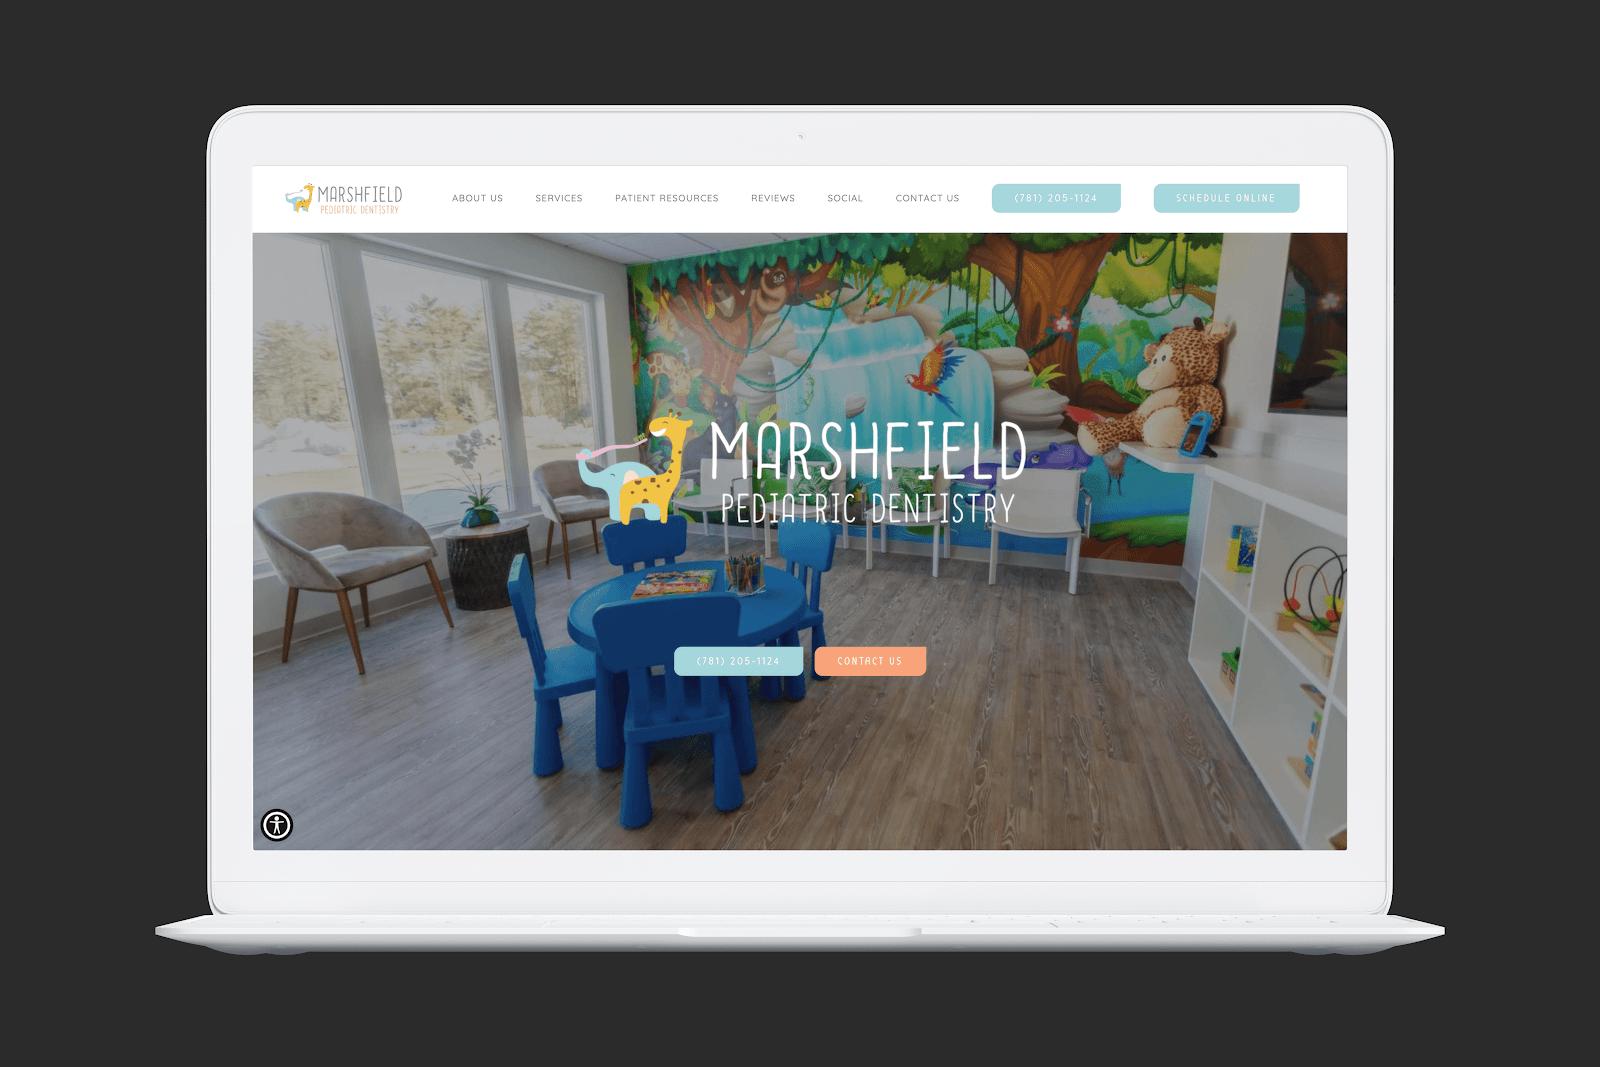 Marshfield Pediatric Dentistry homepage screengrab